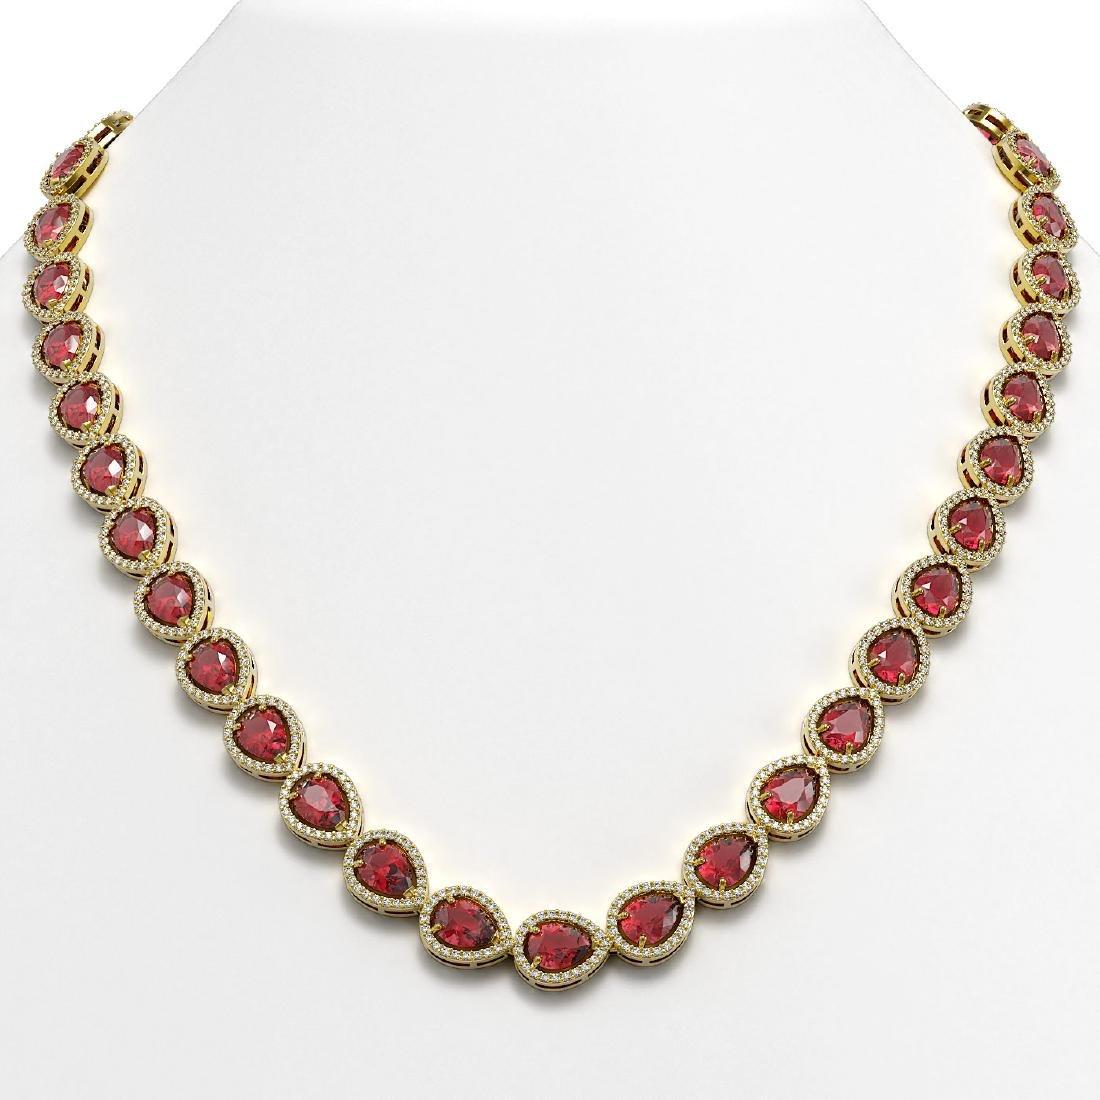 35.13 CTW Tourmaline & Diamond Halo Necklace 10K Yellow